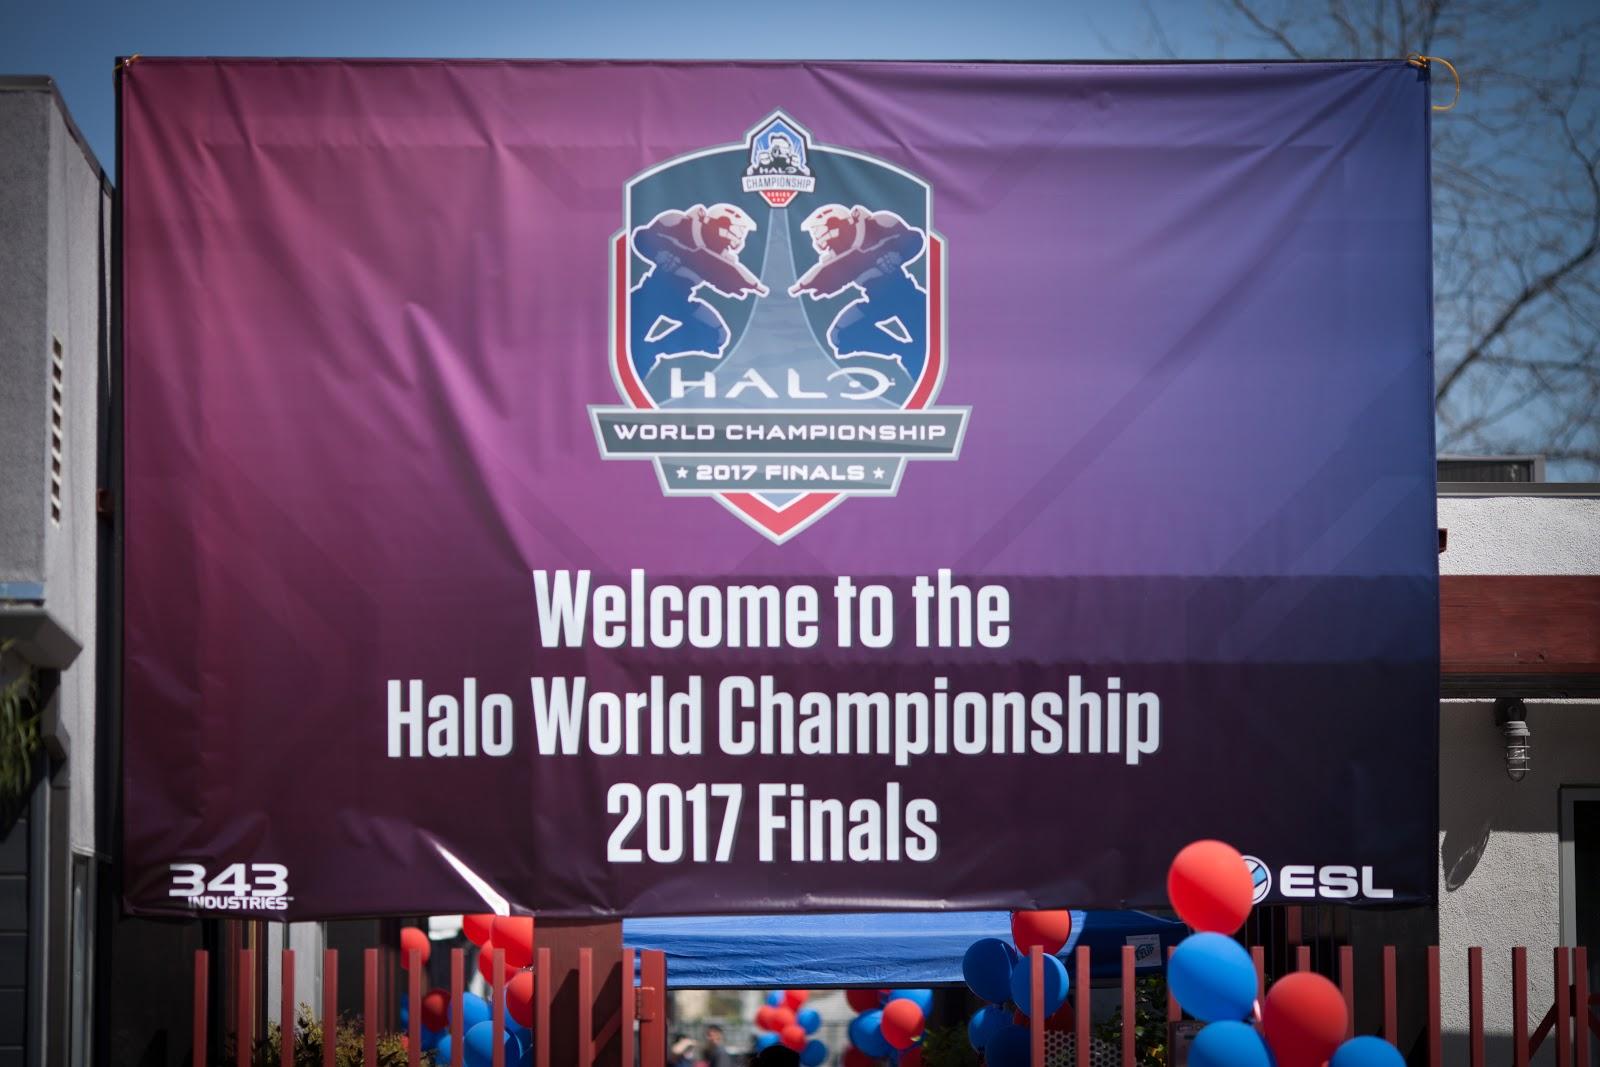 HaloWC 2017 Welcome to HaloWC.jpg